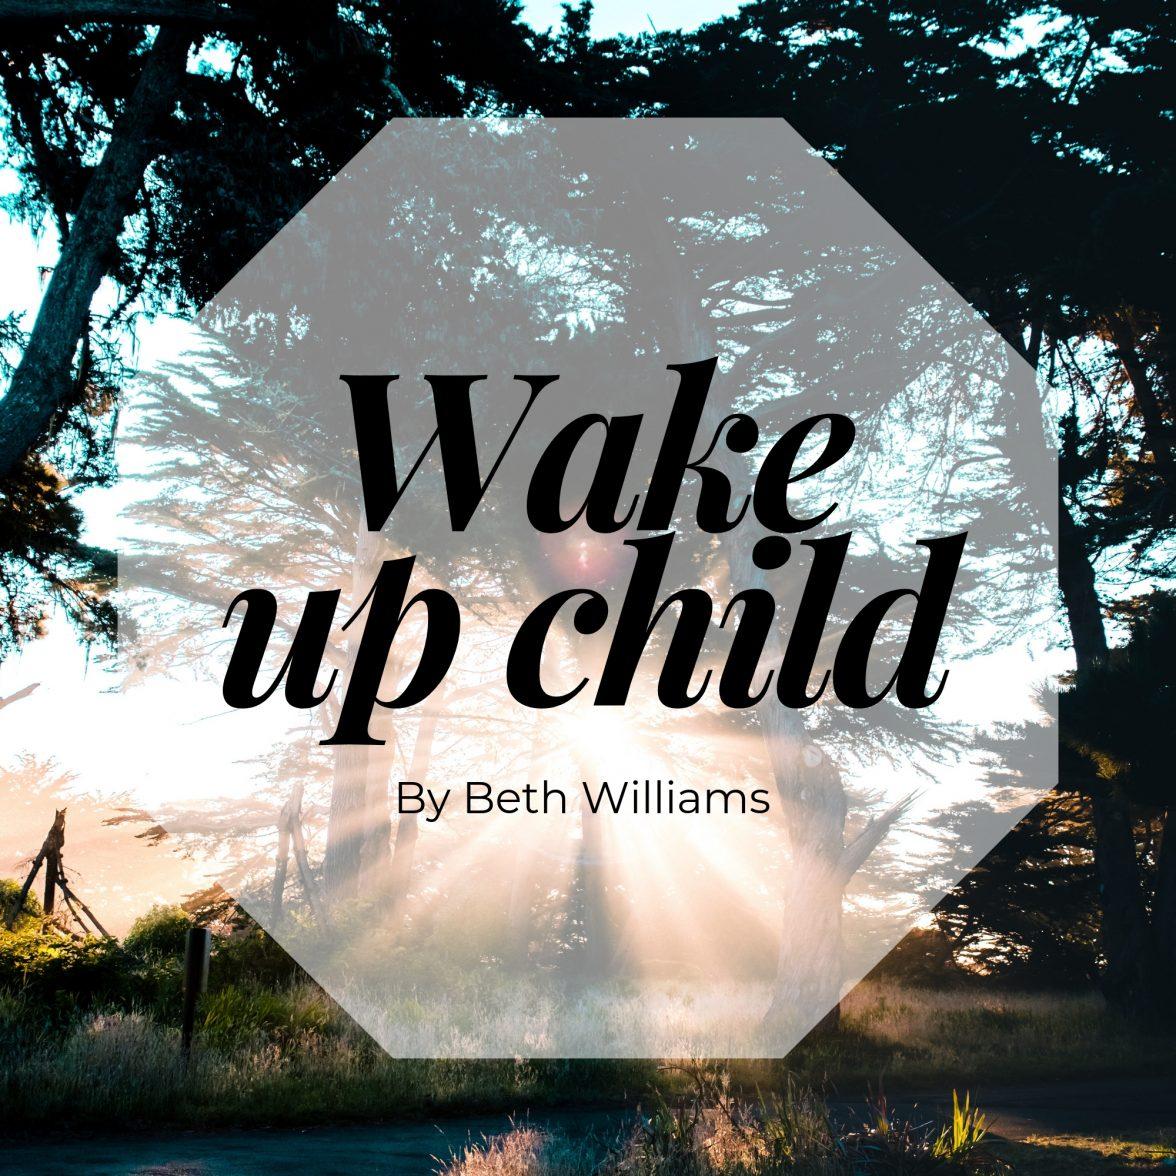 Wake up child, it's resurrection day! - Network Church Sheffield